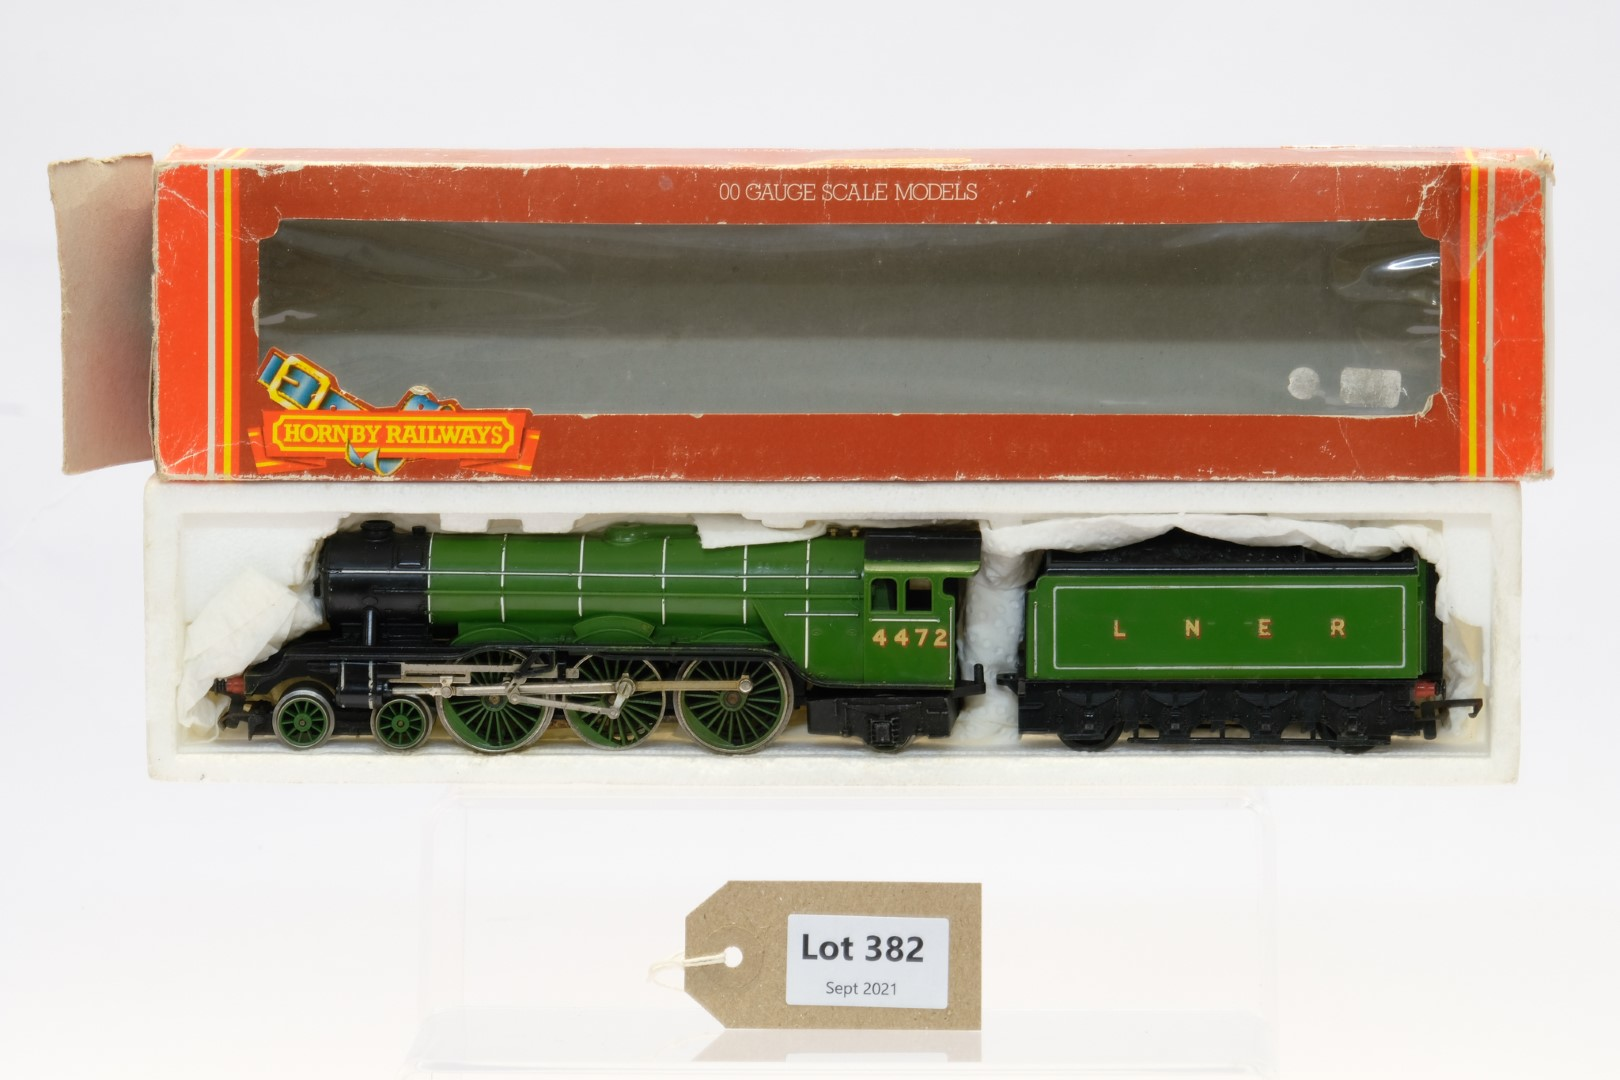 Hornby Class A1 4-6-2 Locomotive 4472 'Flying Scotsman' LNER Green